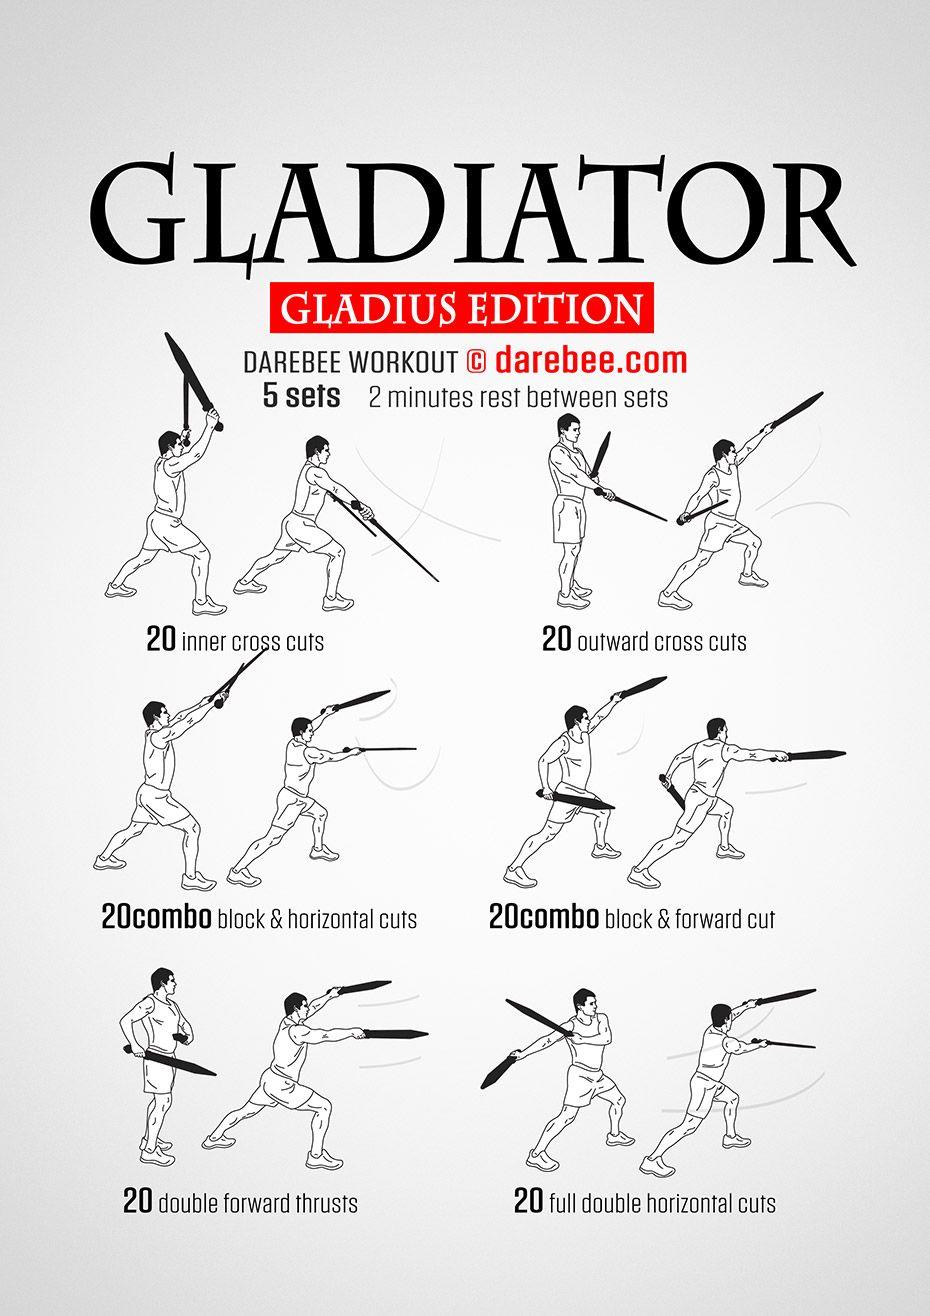 Gladiator gladius workout martial arts workout martial